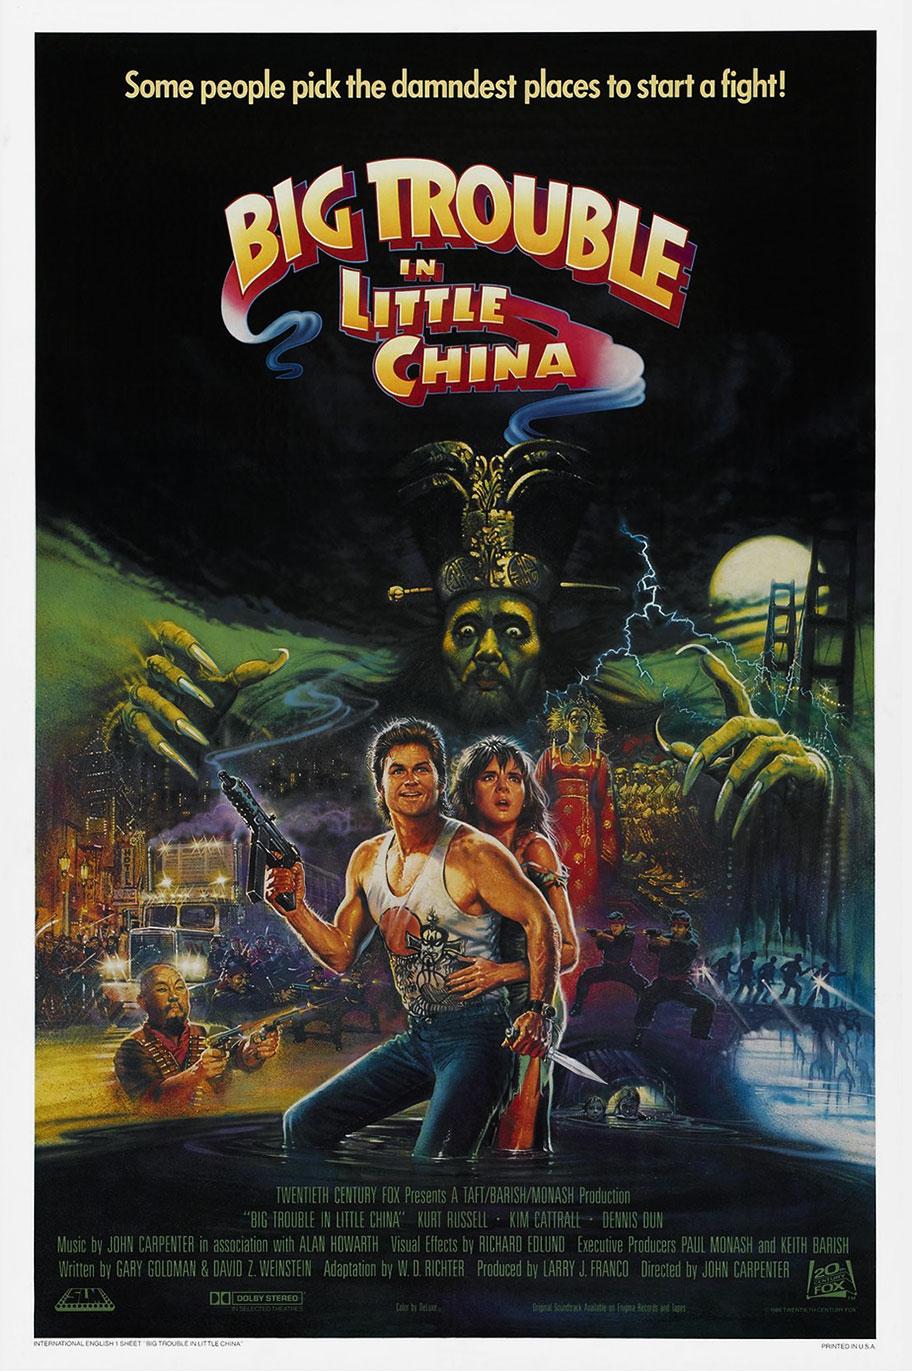 john-carpenter-big-trouble-in-little-china-poster.jpg